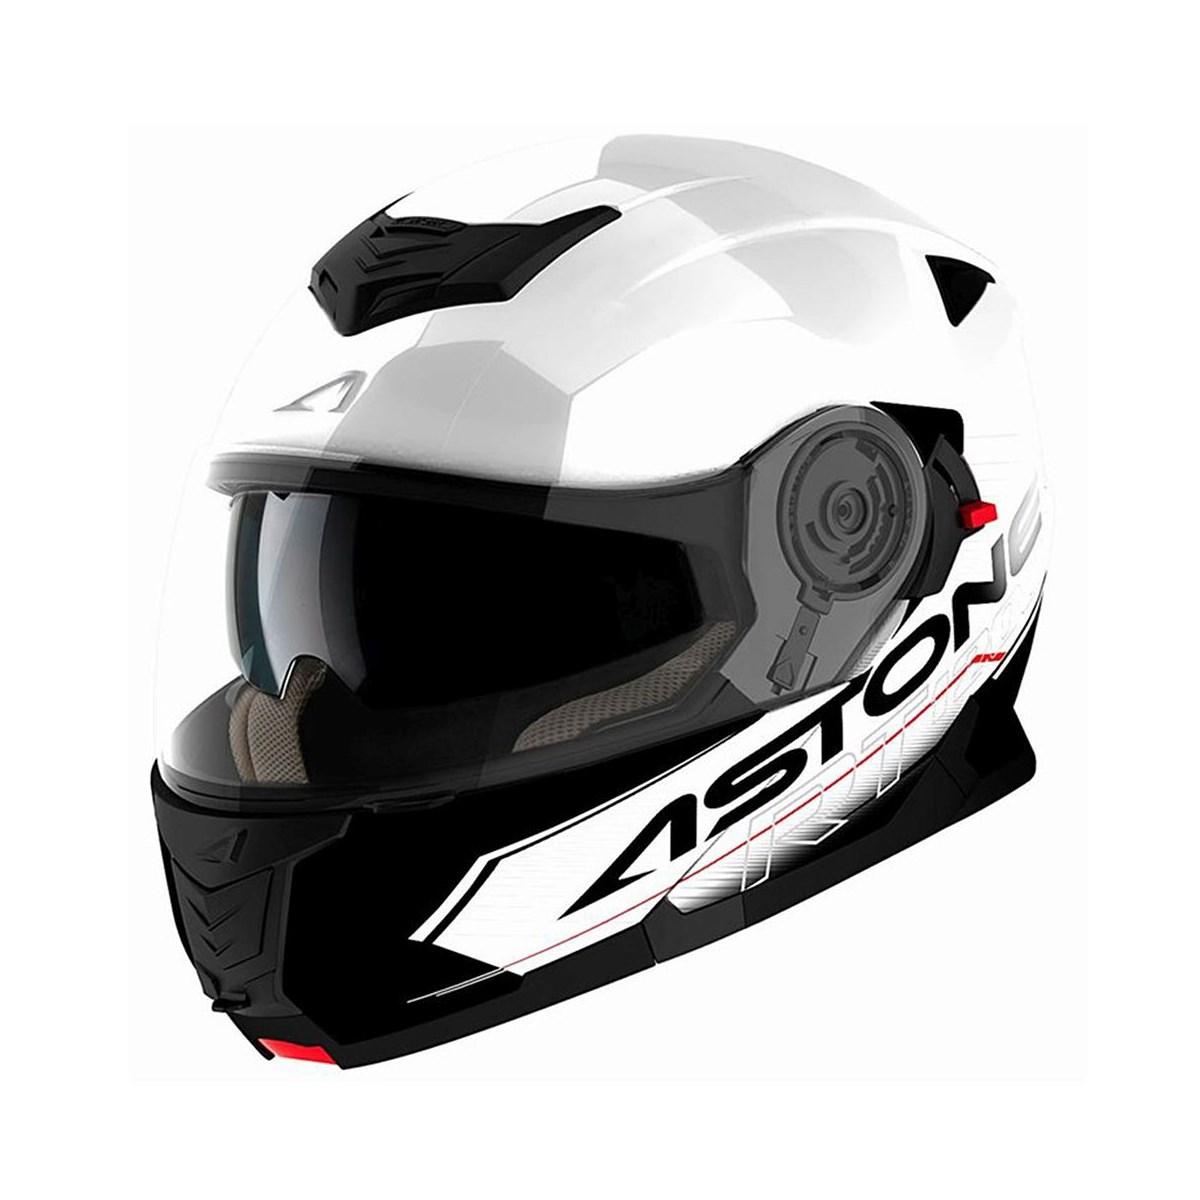 Capacete Astone RT 1200 Touring